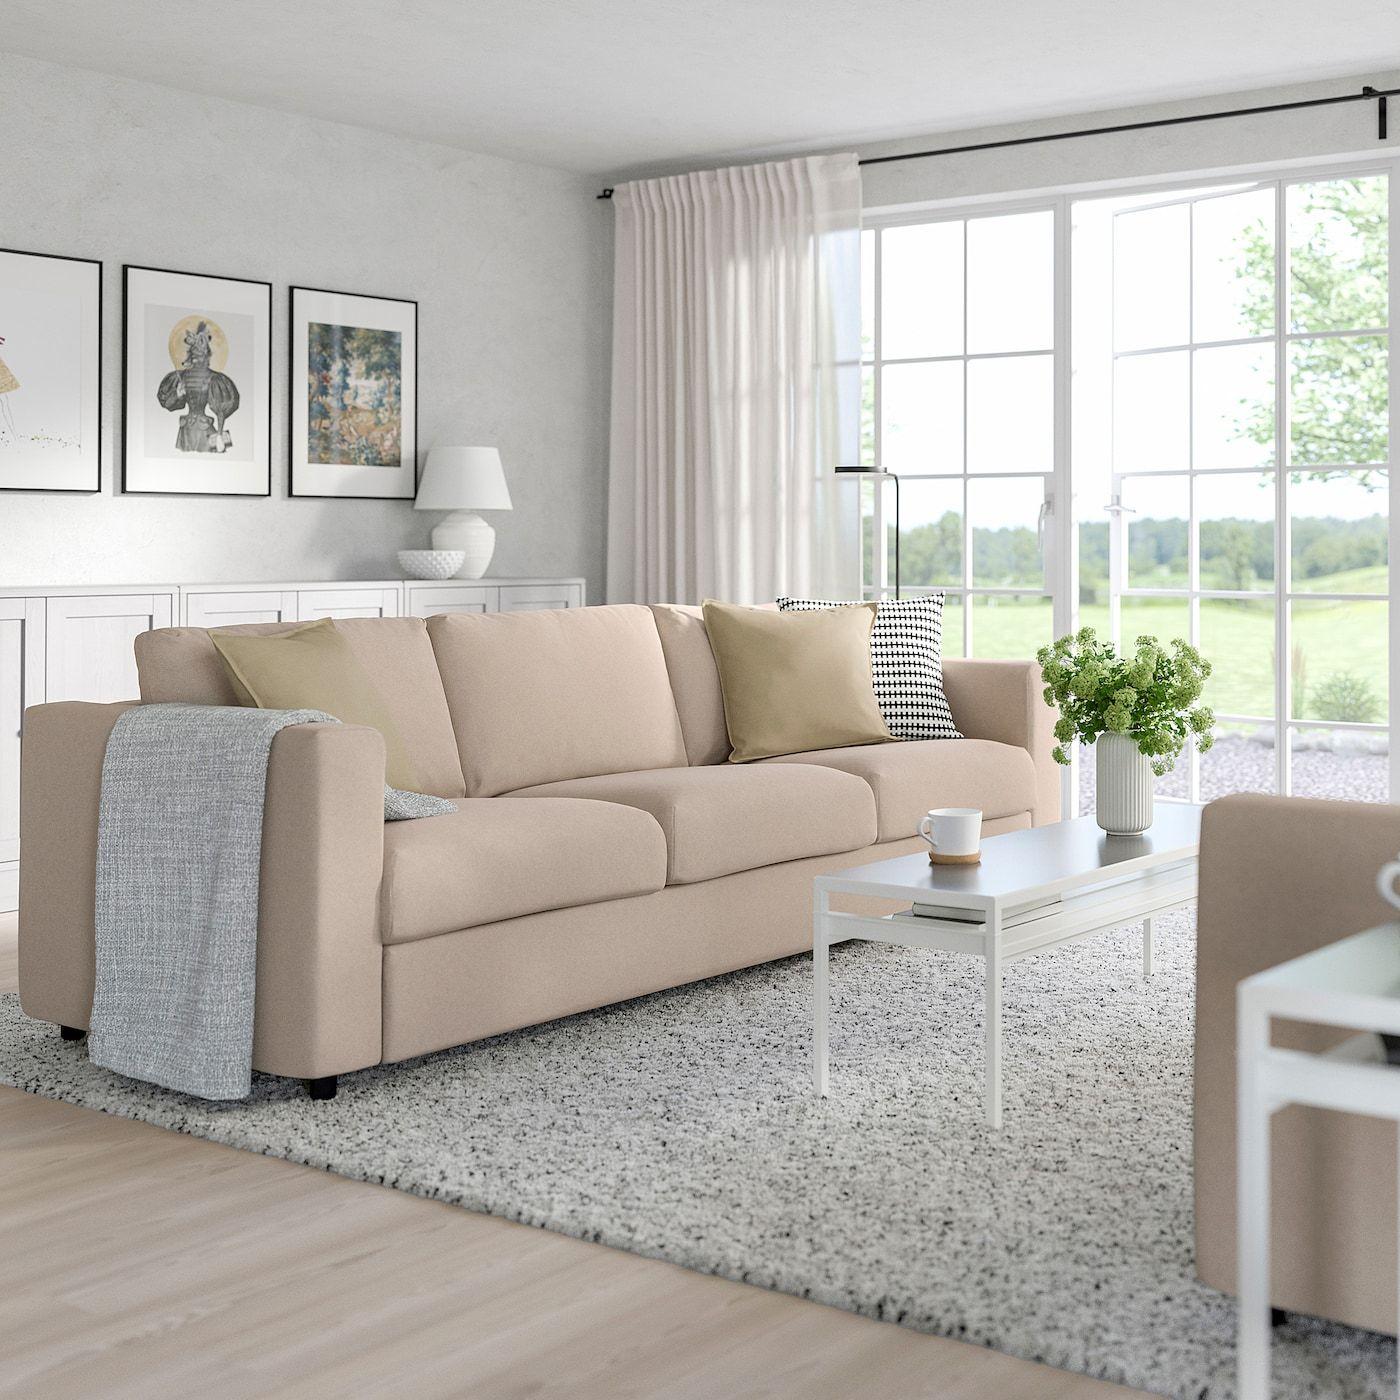 Ikea Vimle 3er Sofa Tallmyra Beige In 2020 Bettsofa 3er Sofa Sofa